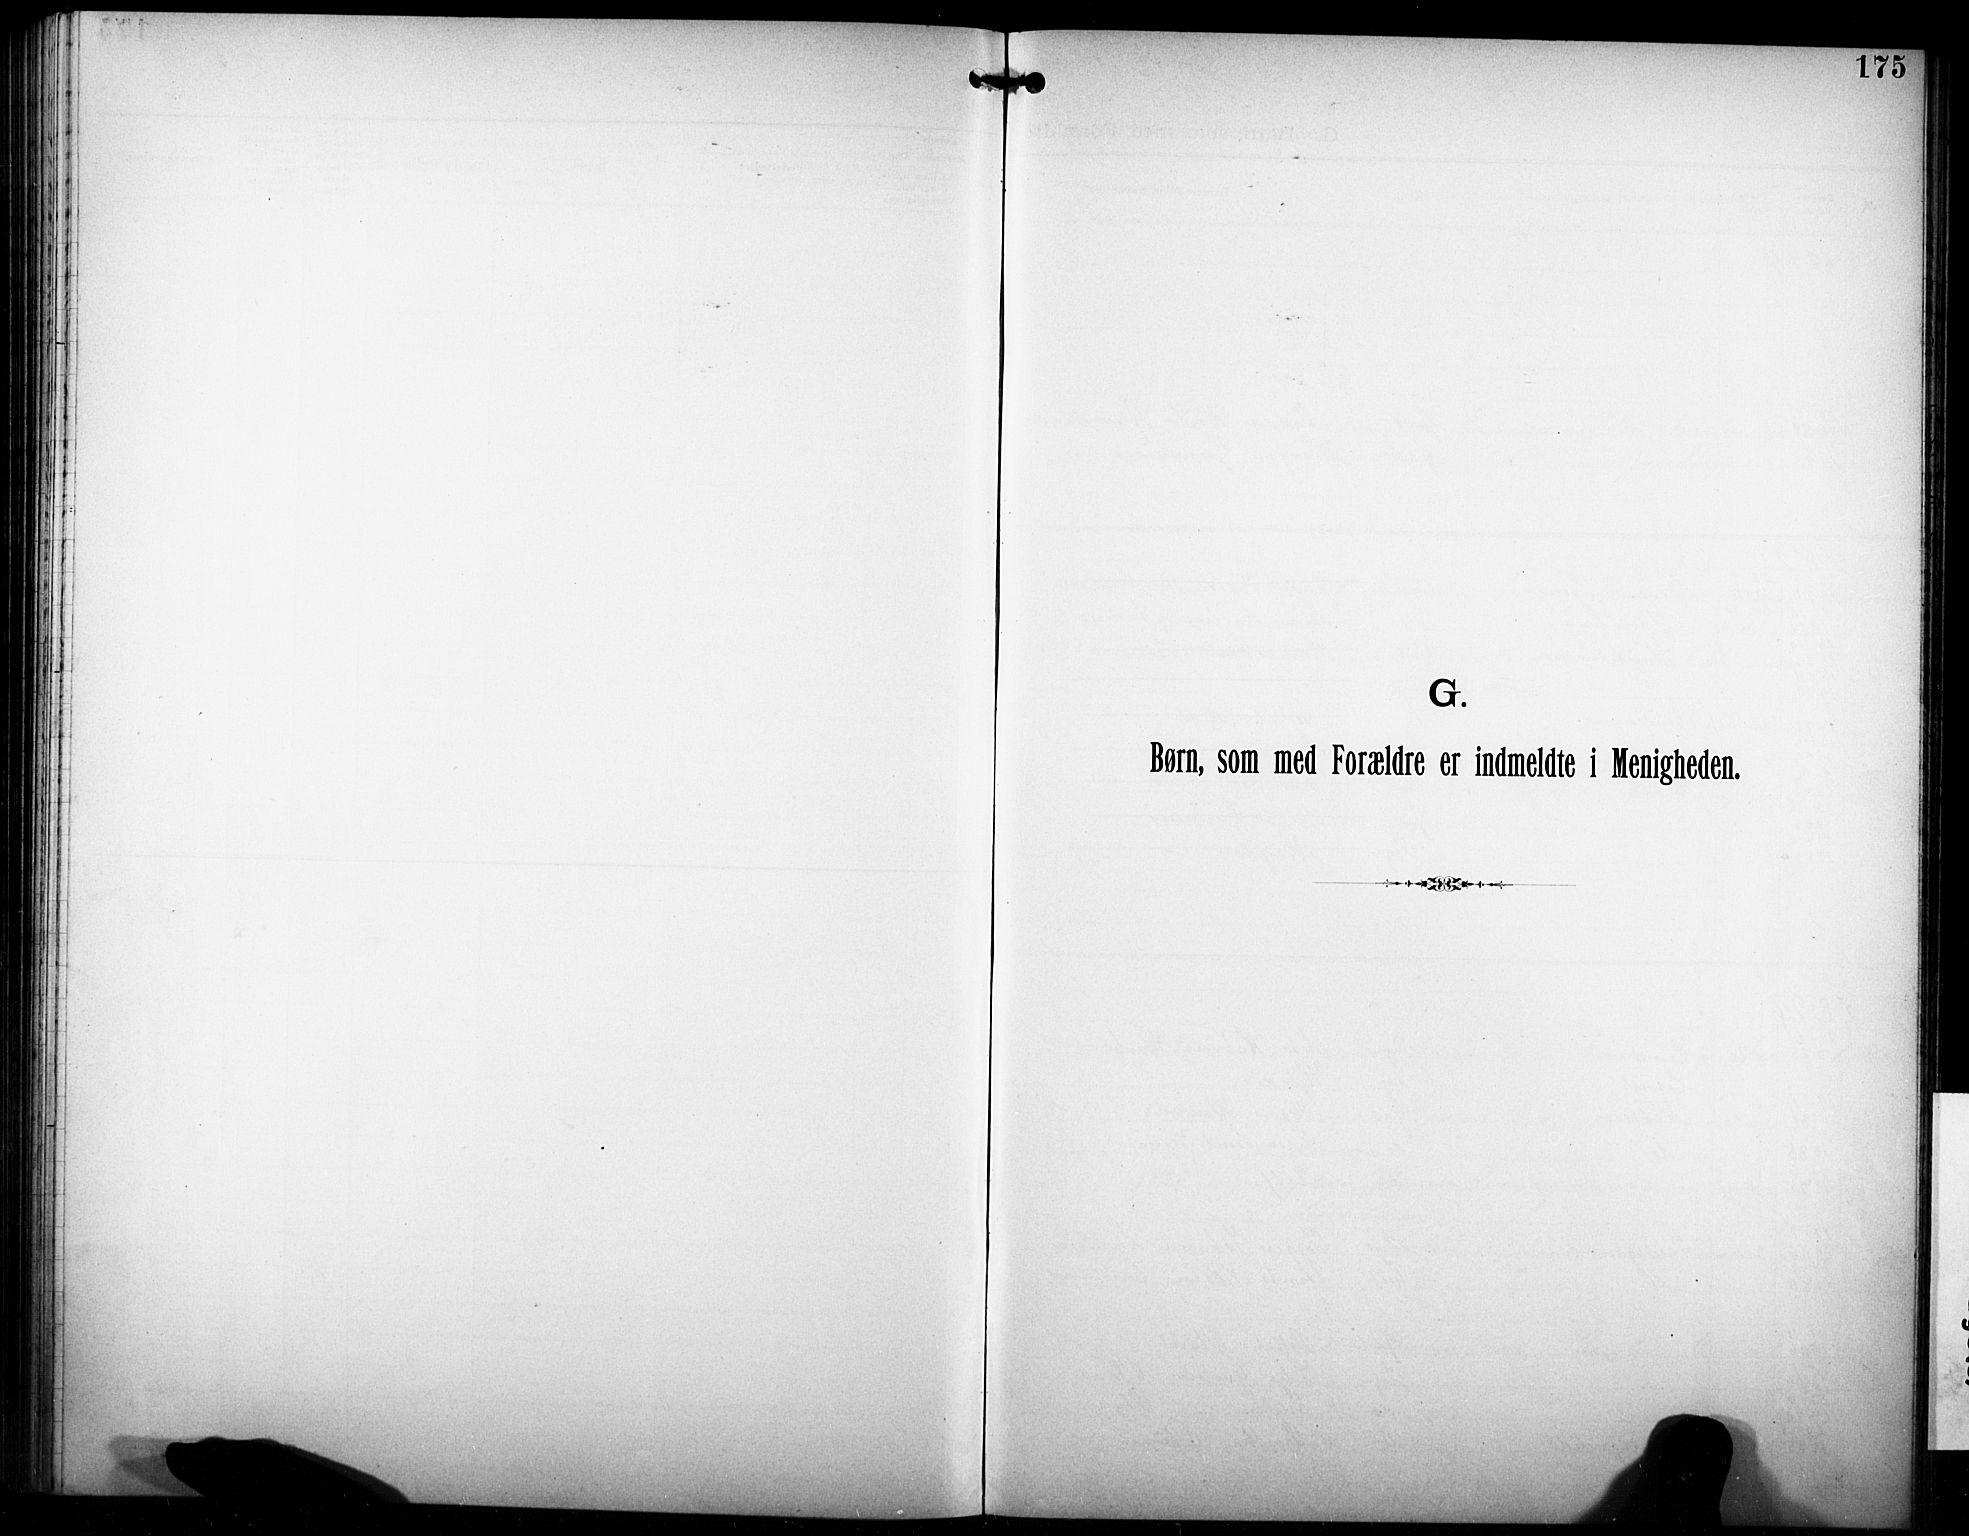 SAKO, Den katolsk-apostoliske menighet i Larvik, F/Fa/L0001: Dissenterprotokoll nr. 1, 1892-1933, s. 175